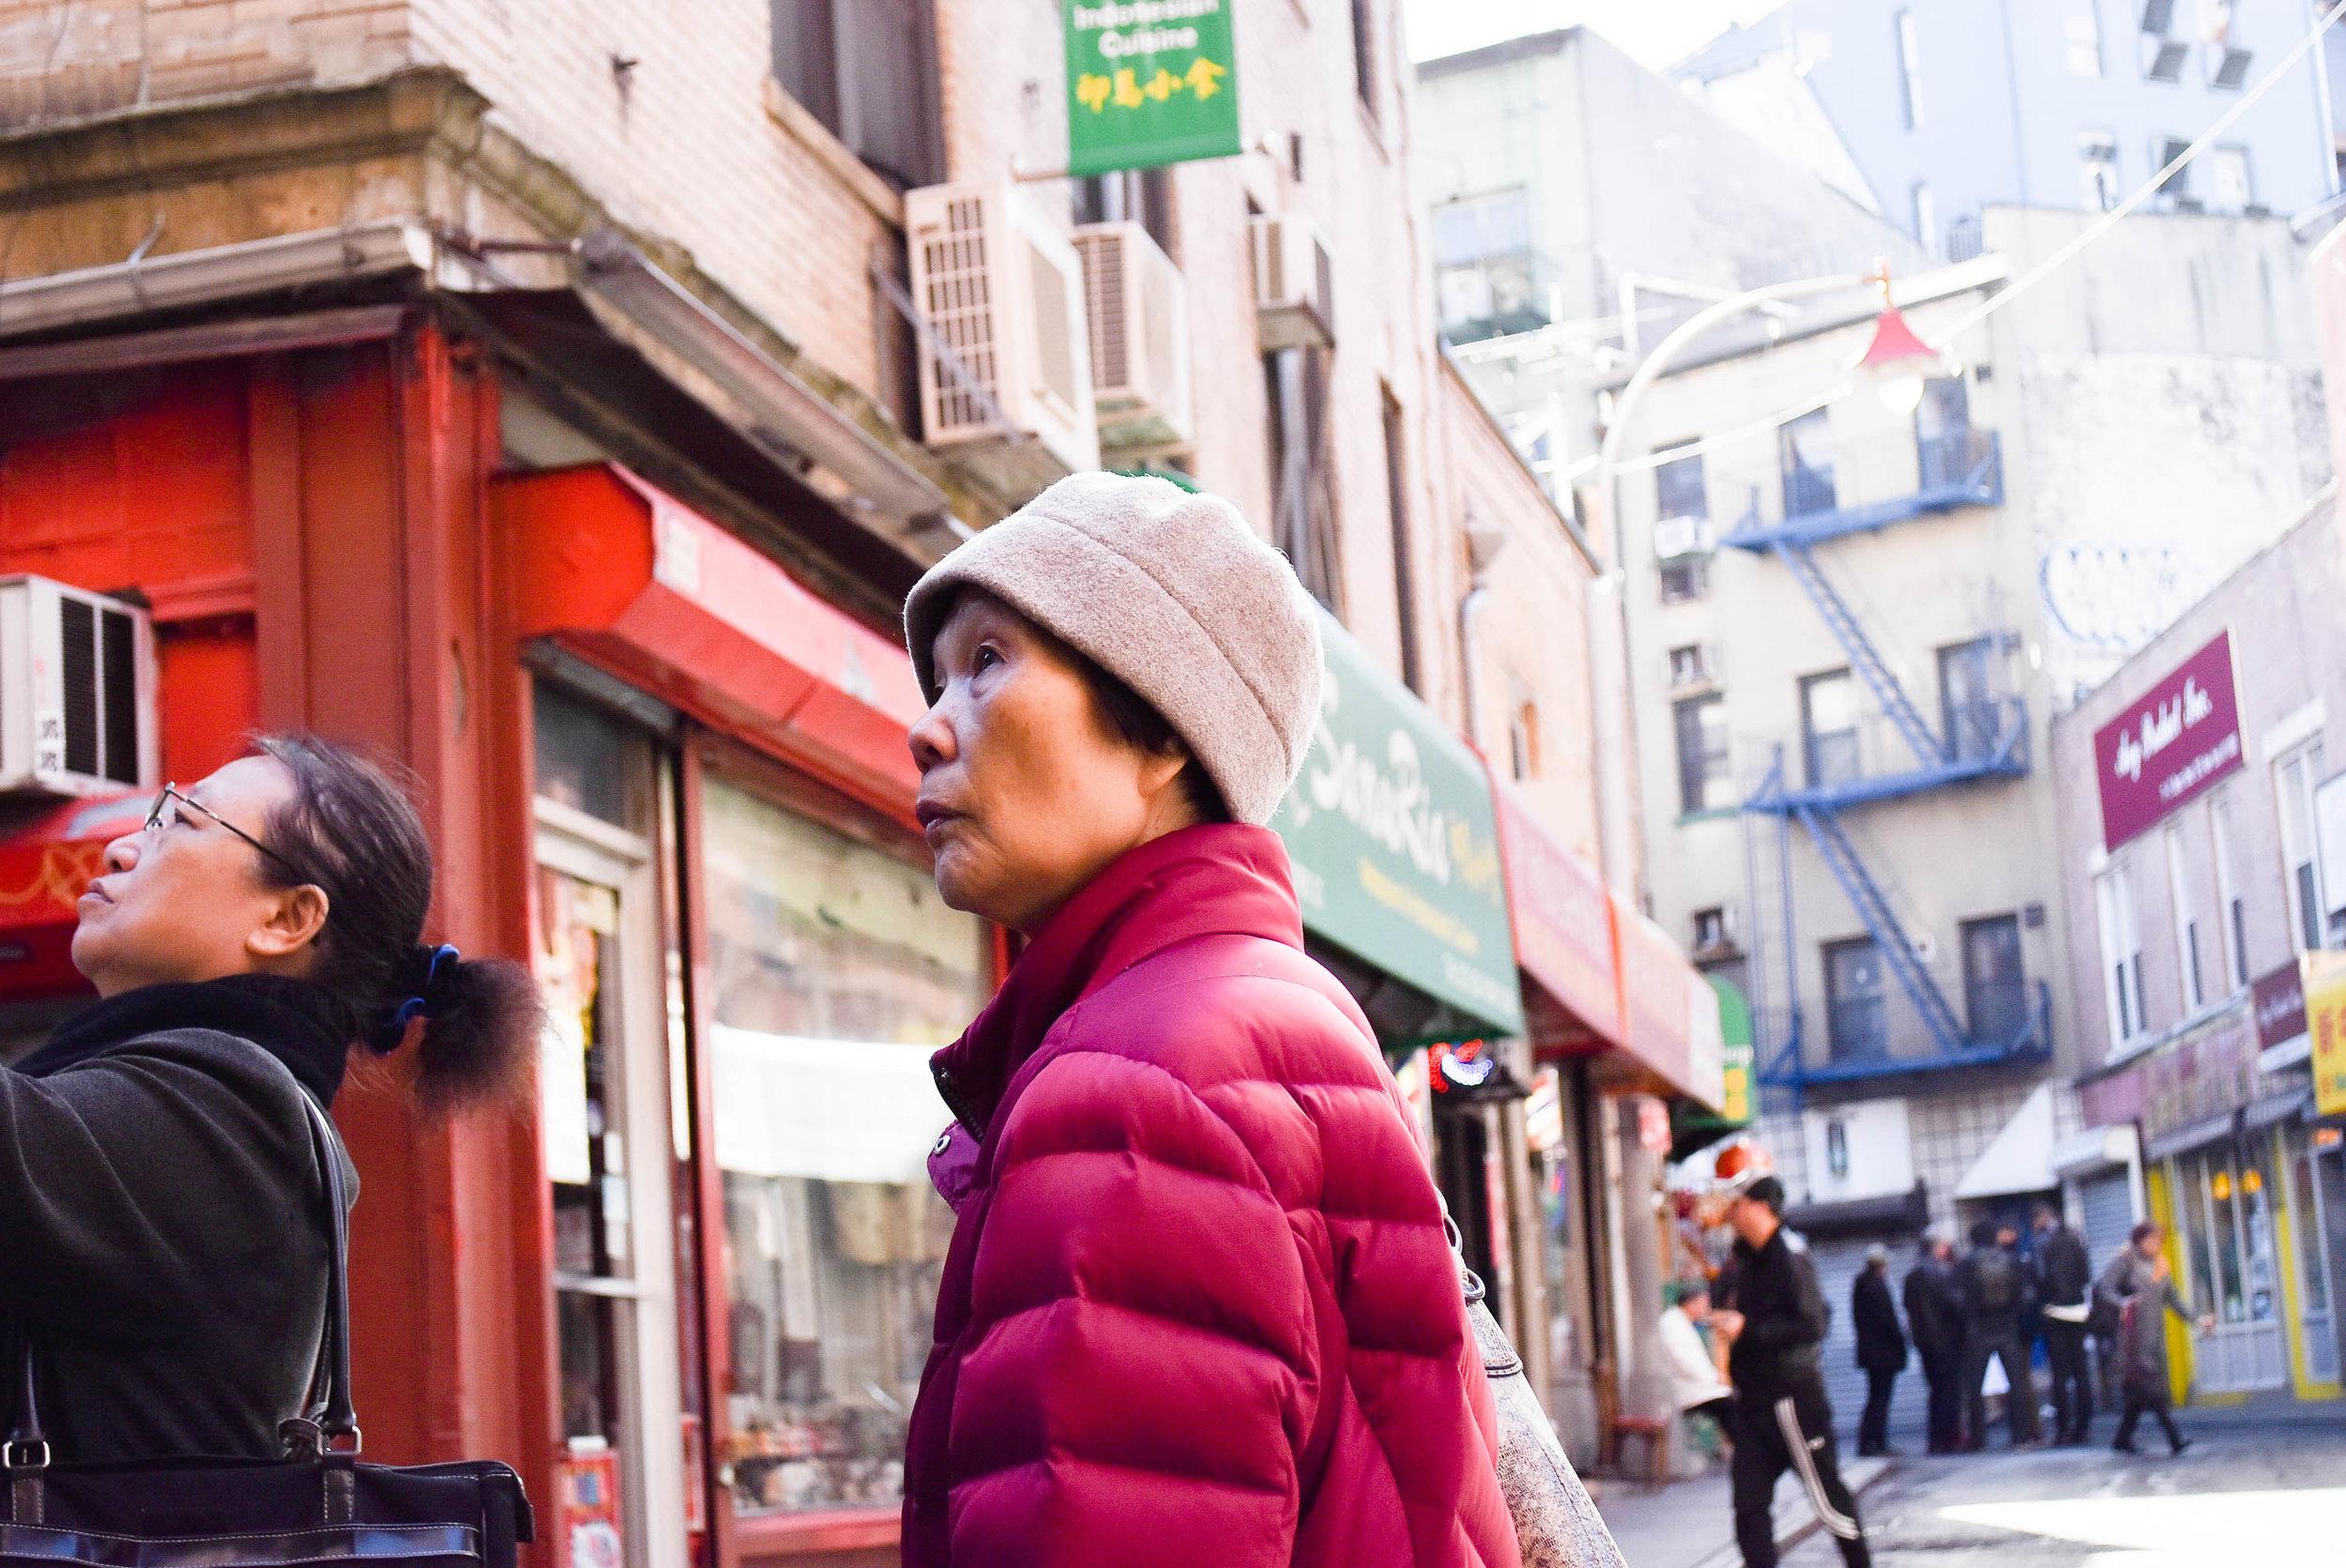 Senior in Pink Jacket, Chinatown, NYC - Nov 2016